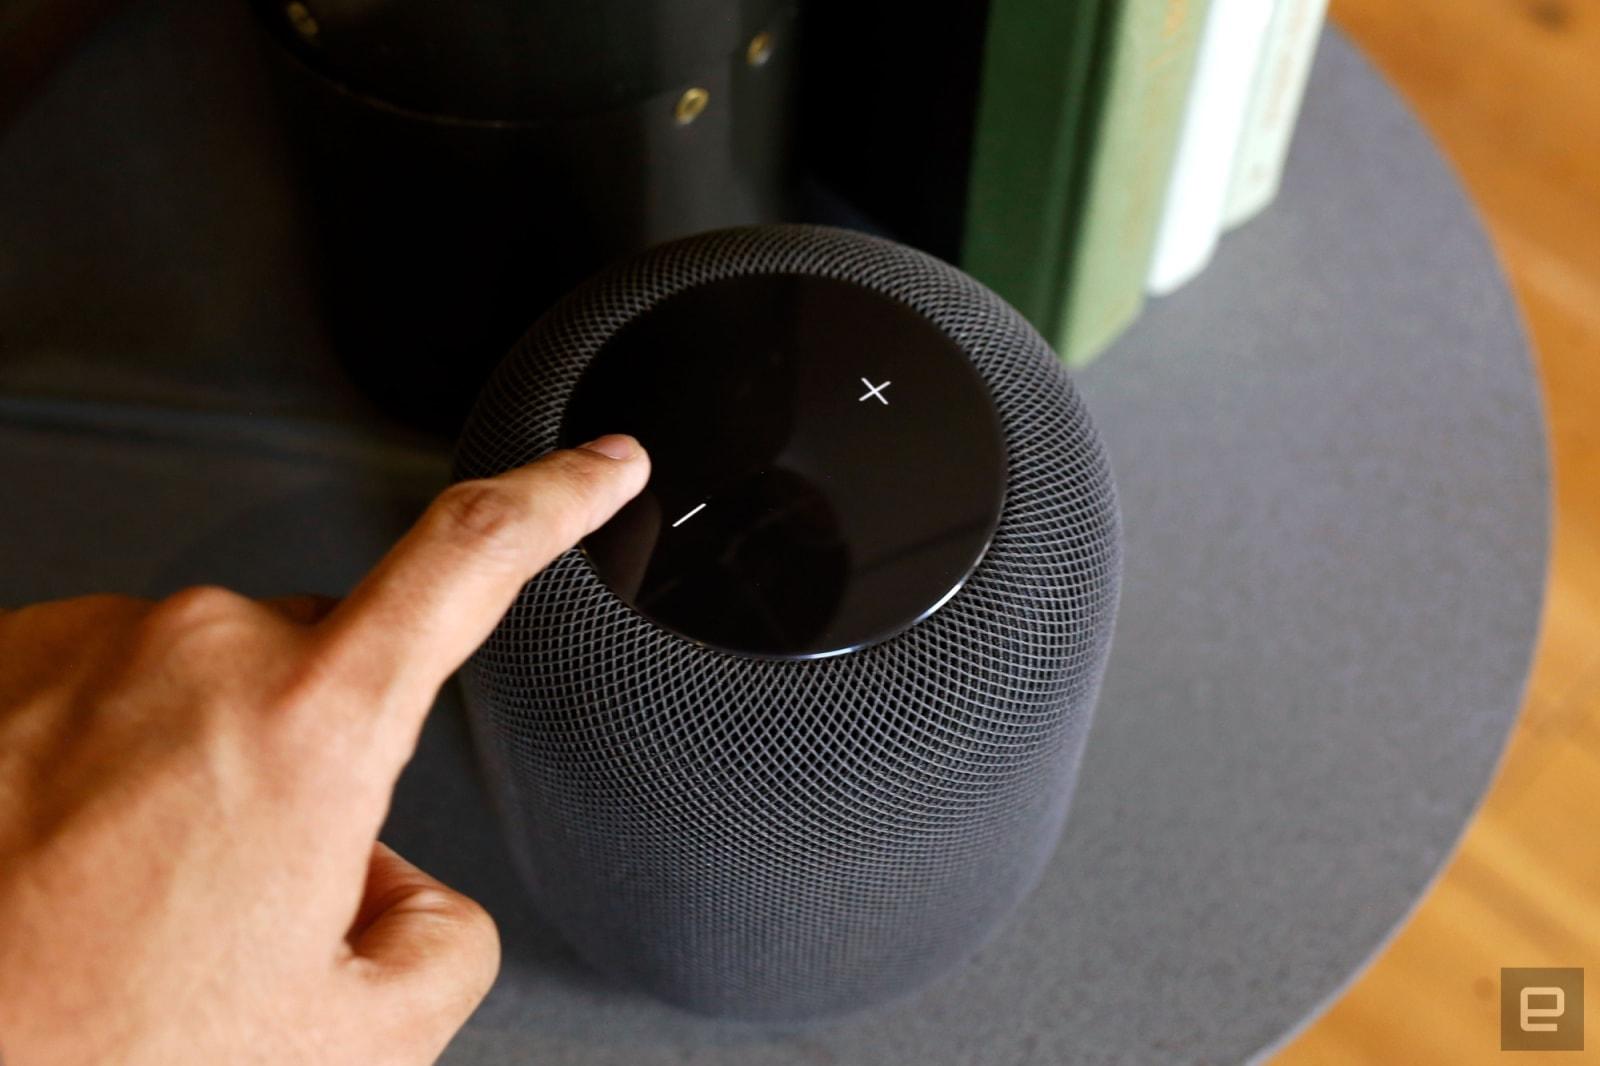 HomePod radio streaming arrives on September 30th